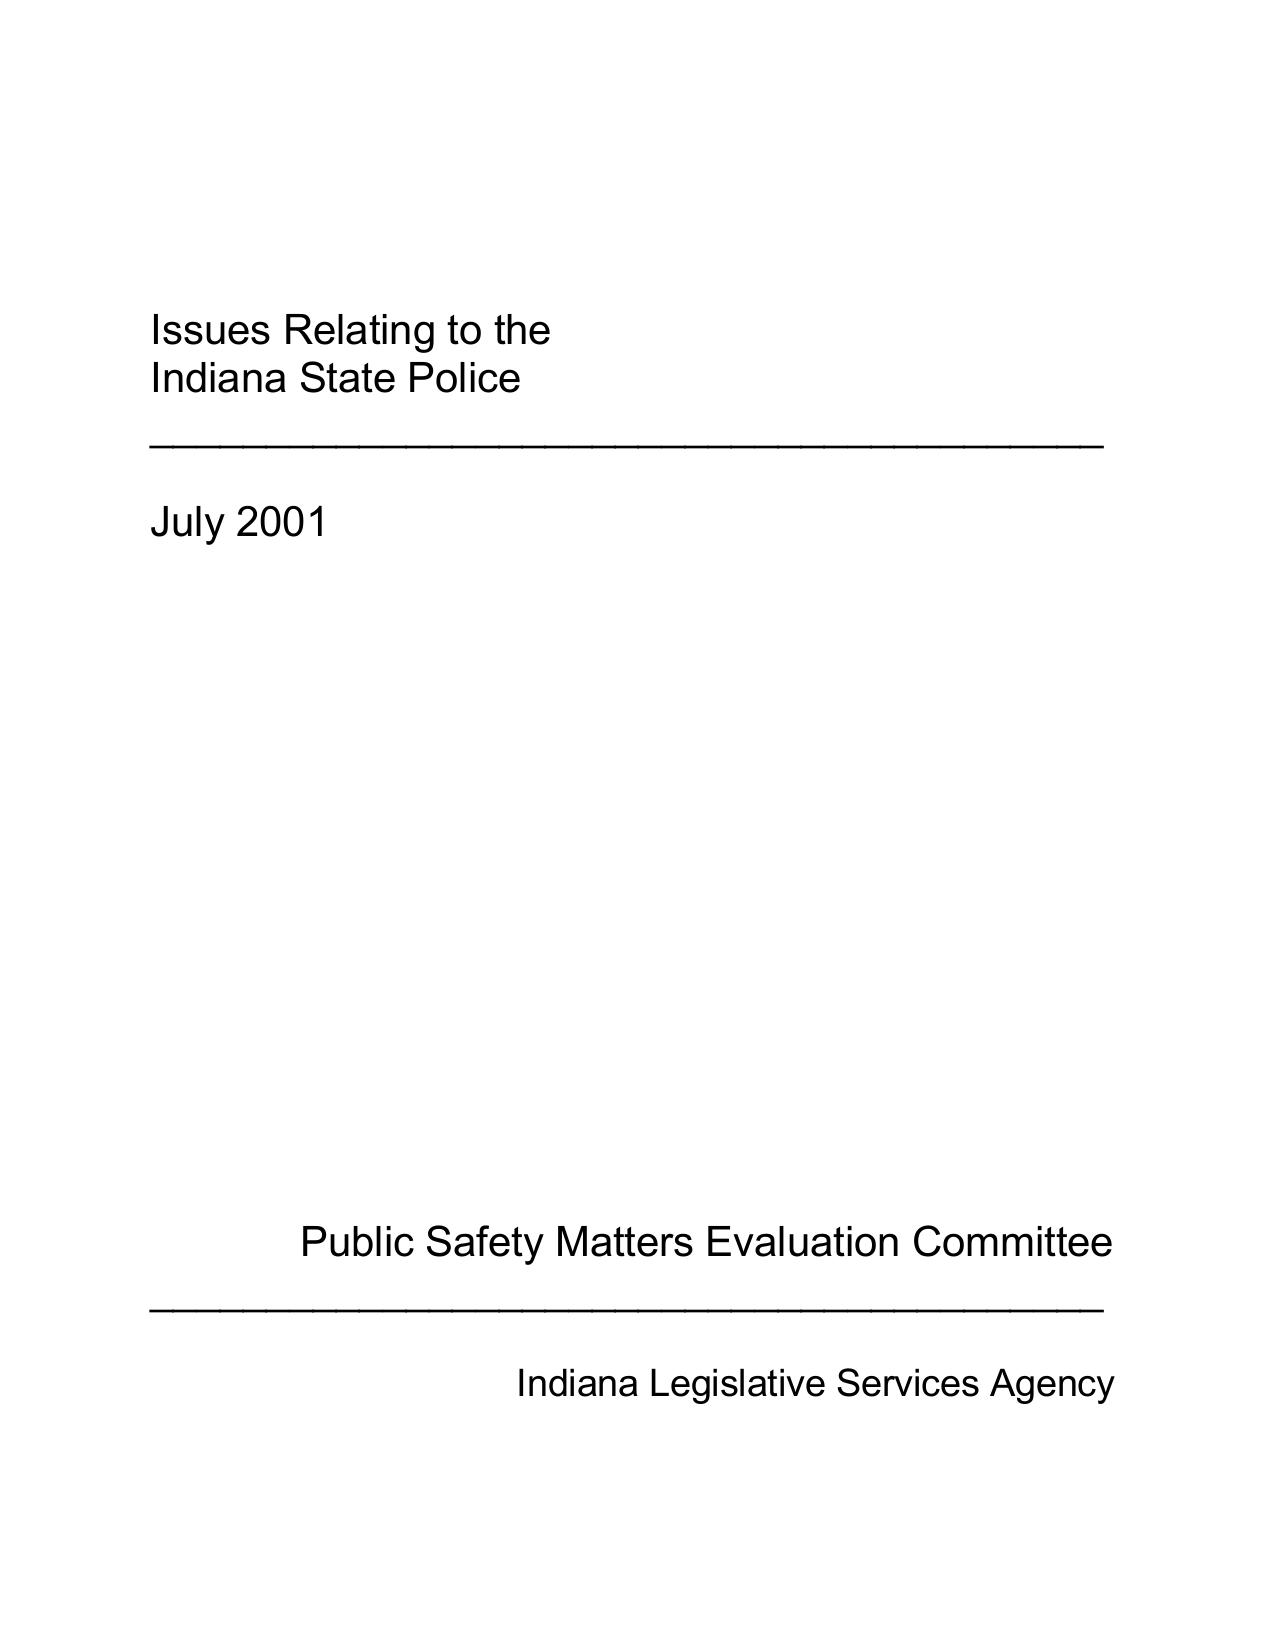 pdf for Owi Speaker IC5-710 manual